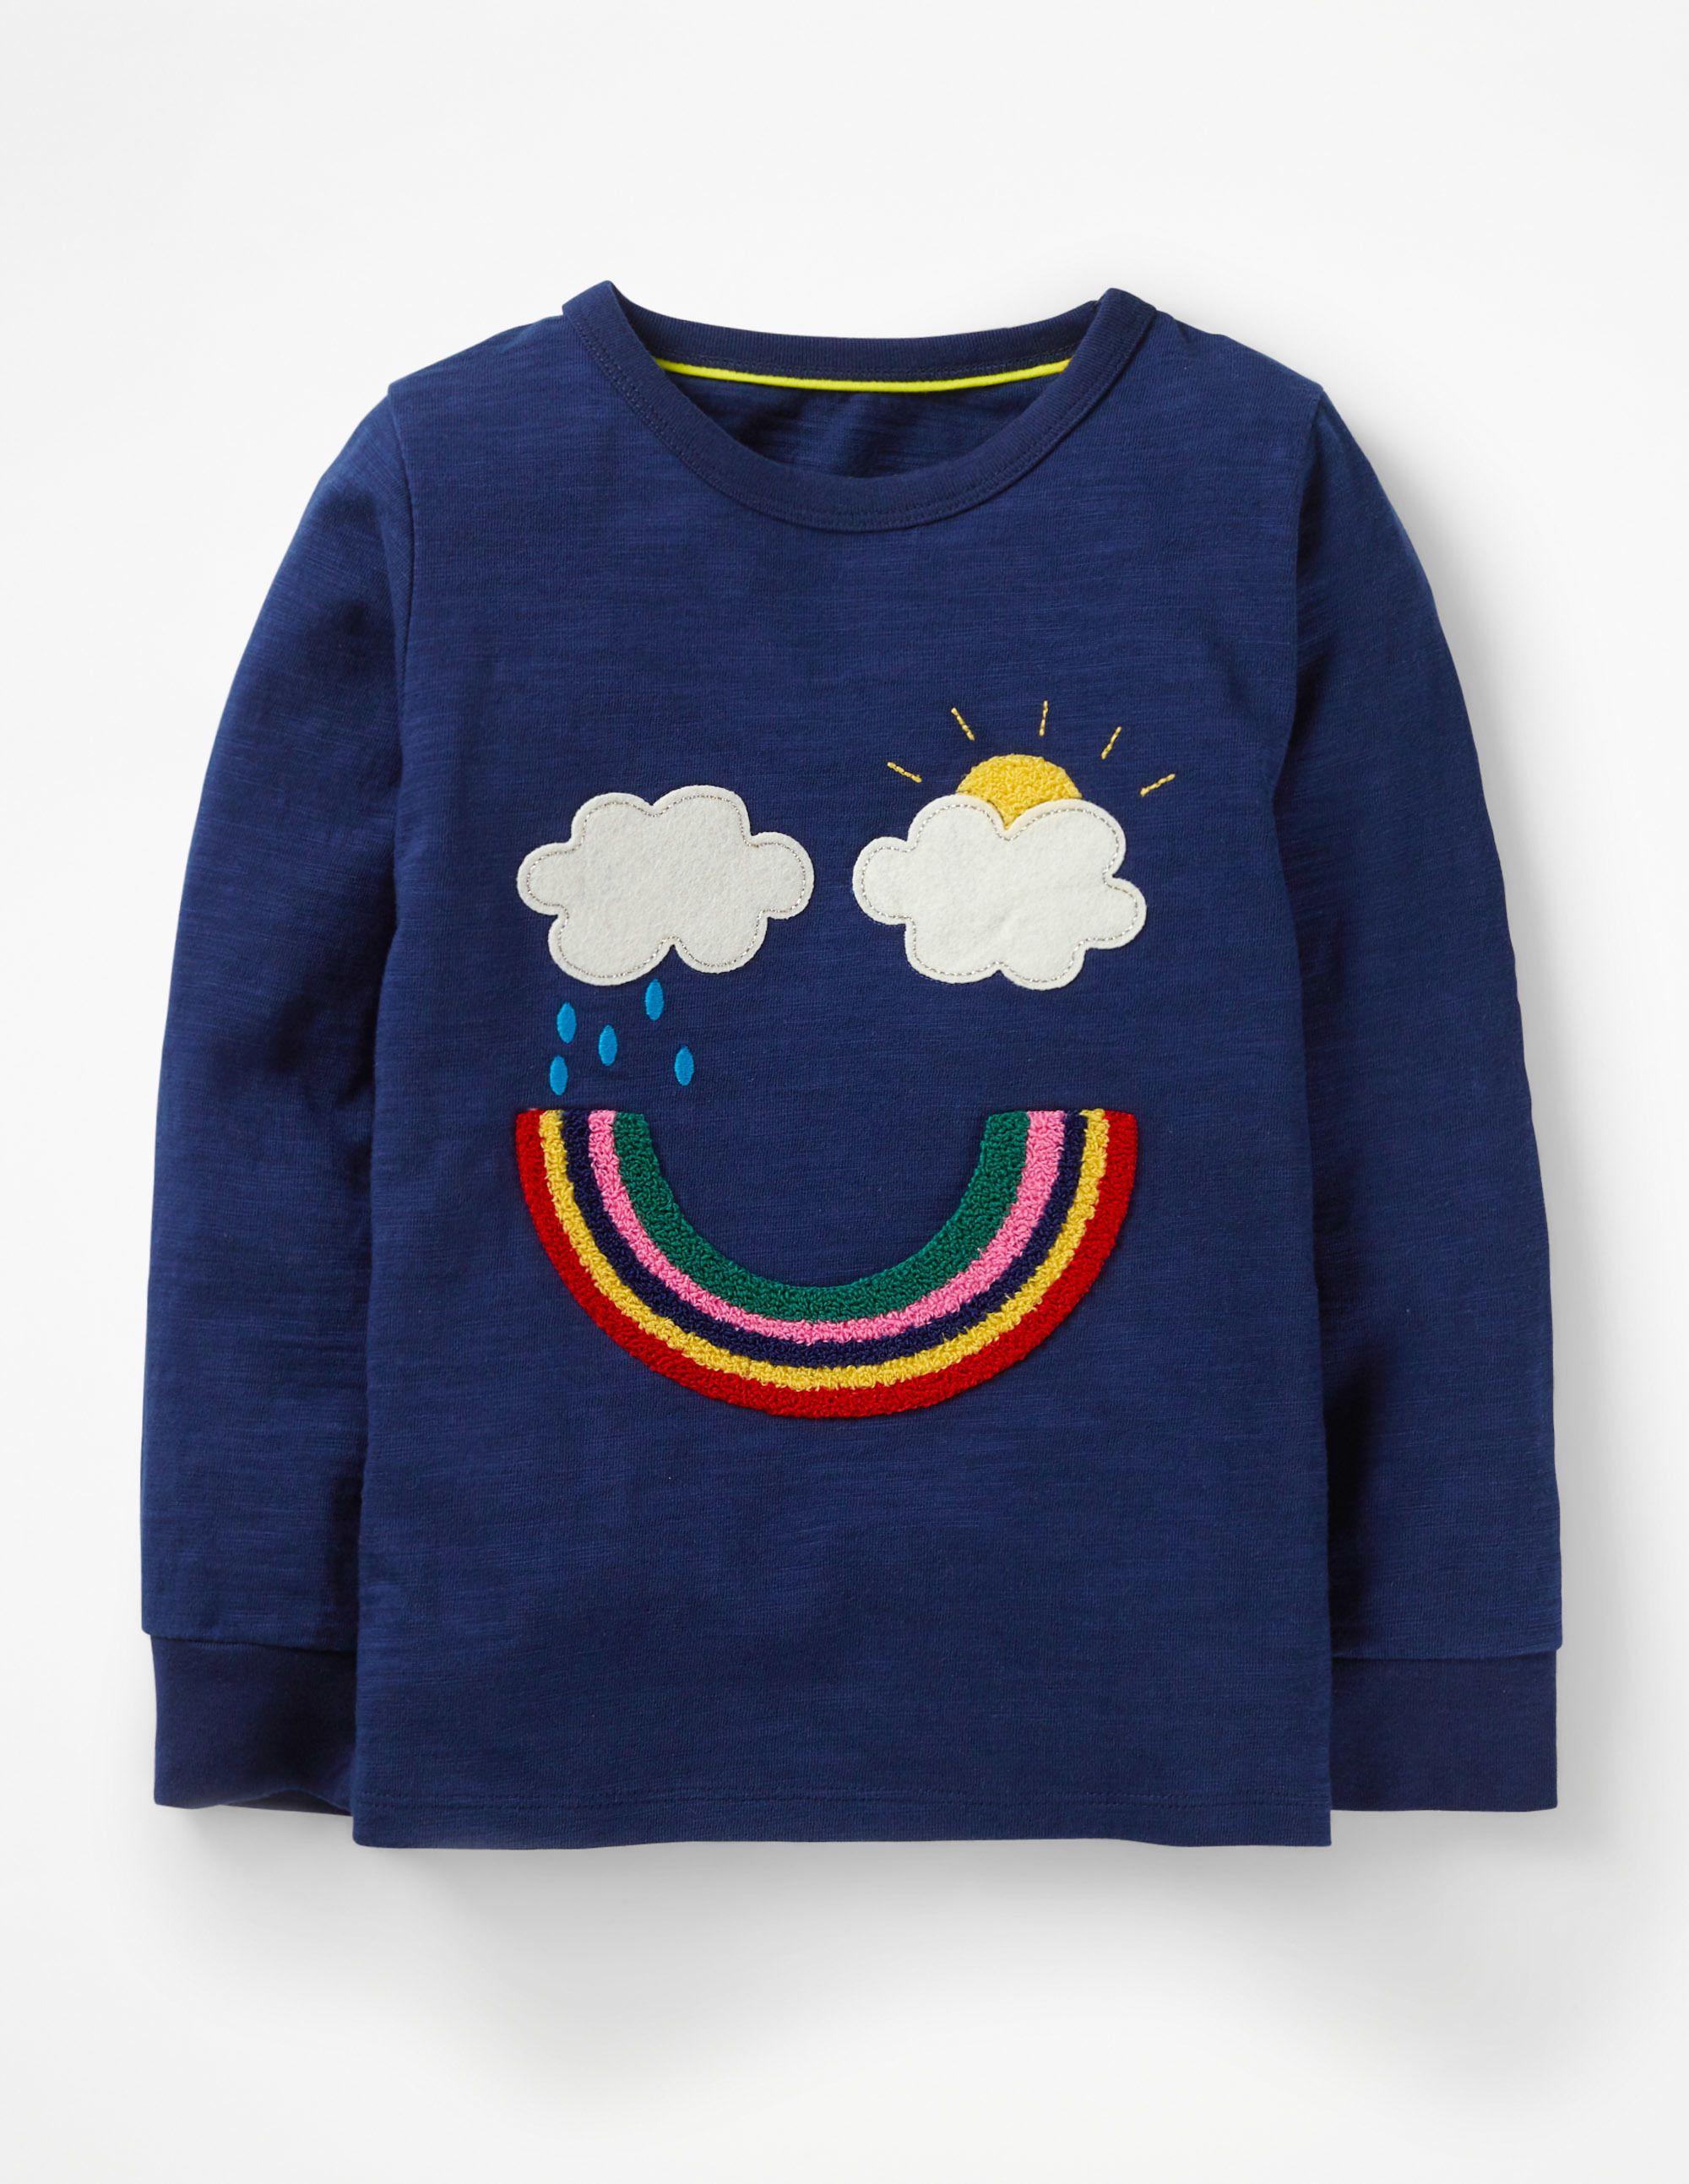 Mud Kingdom Children Unisex Cartoon Elephants Knitted Pullover Sweater